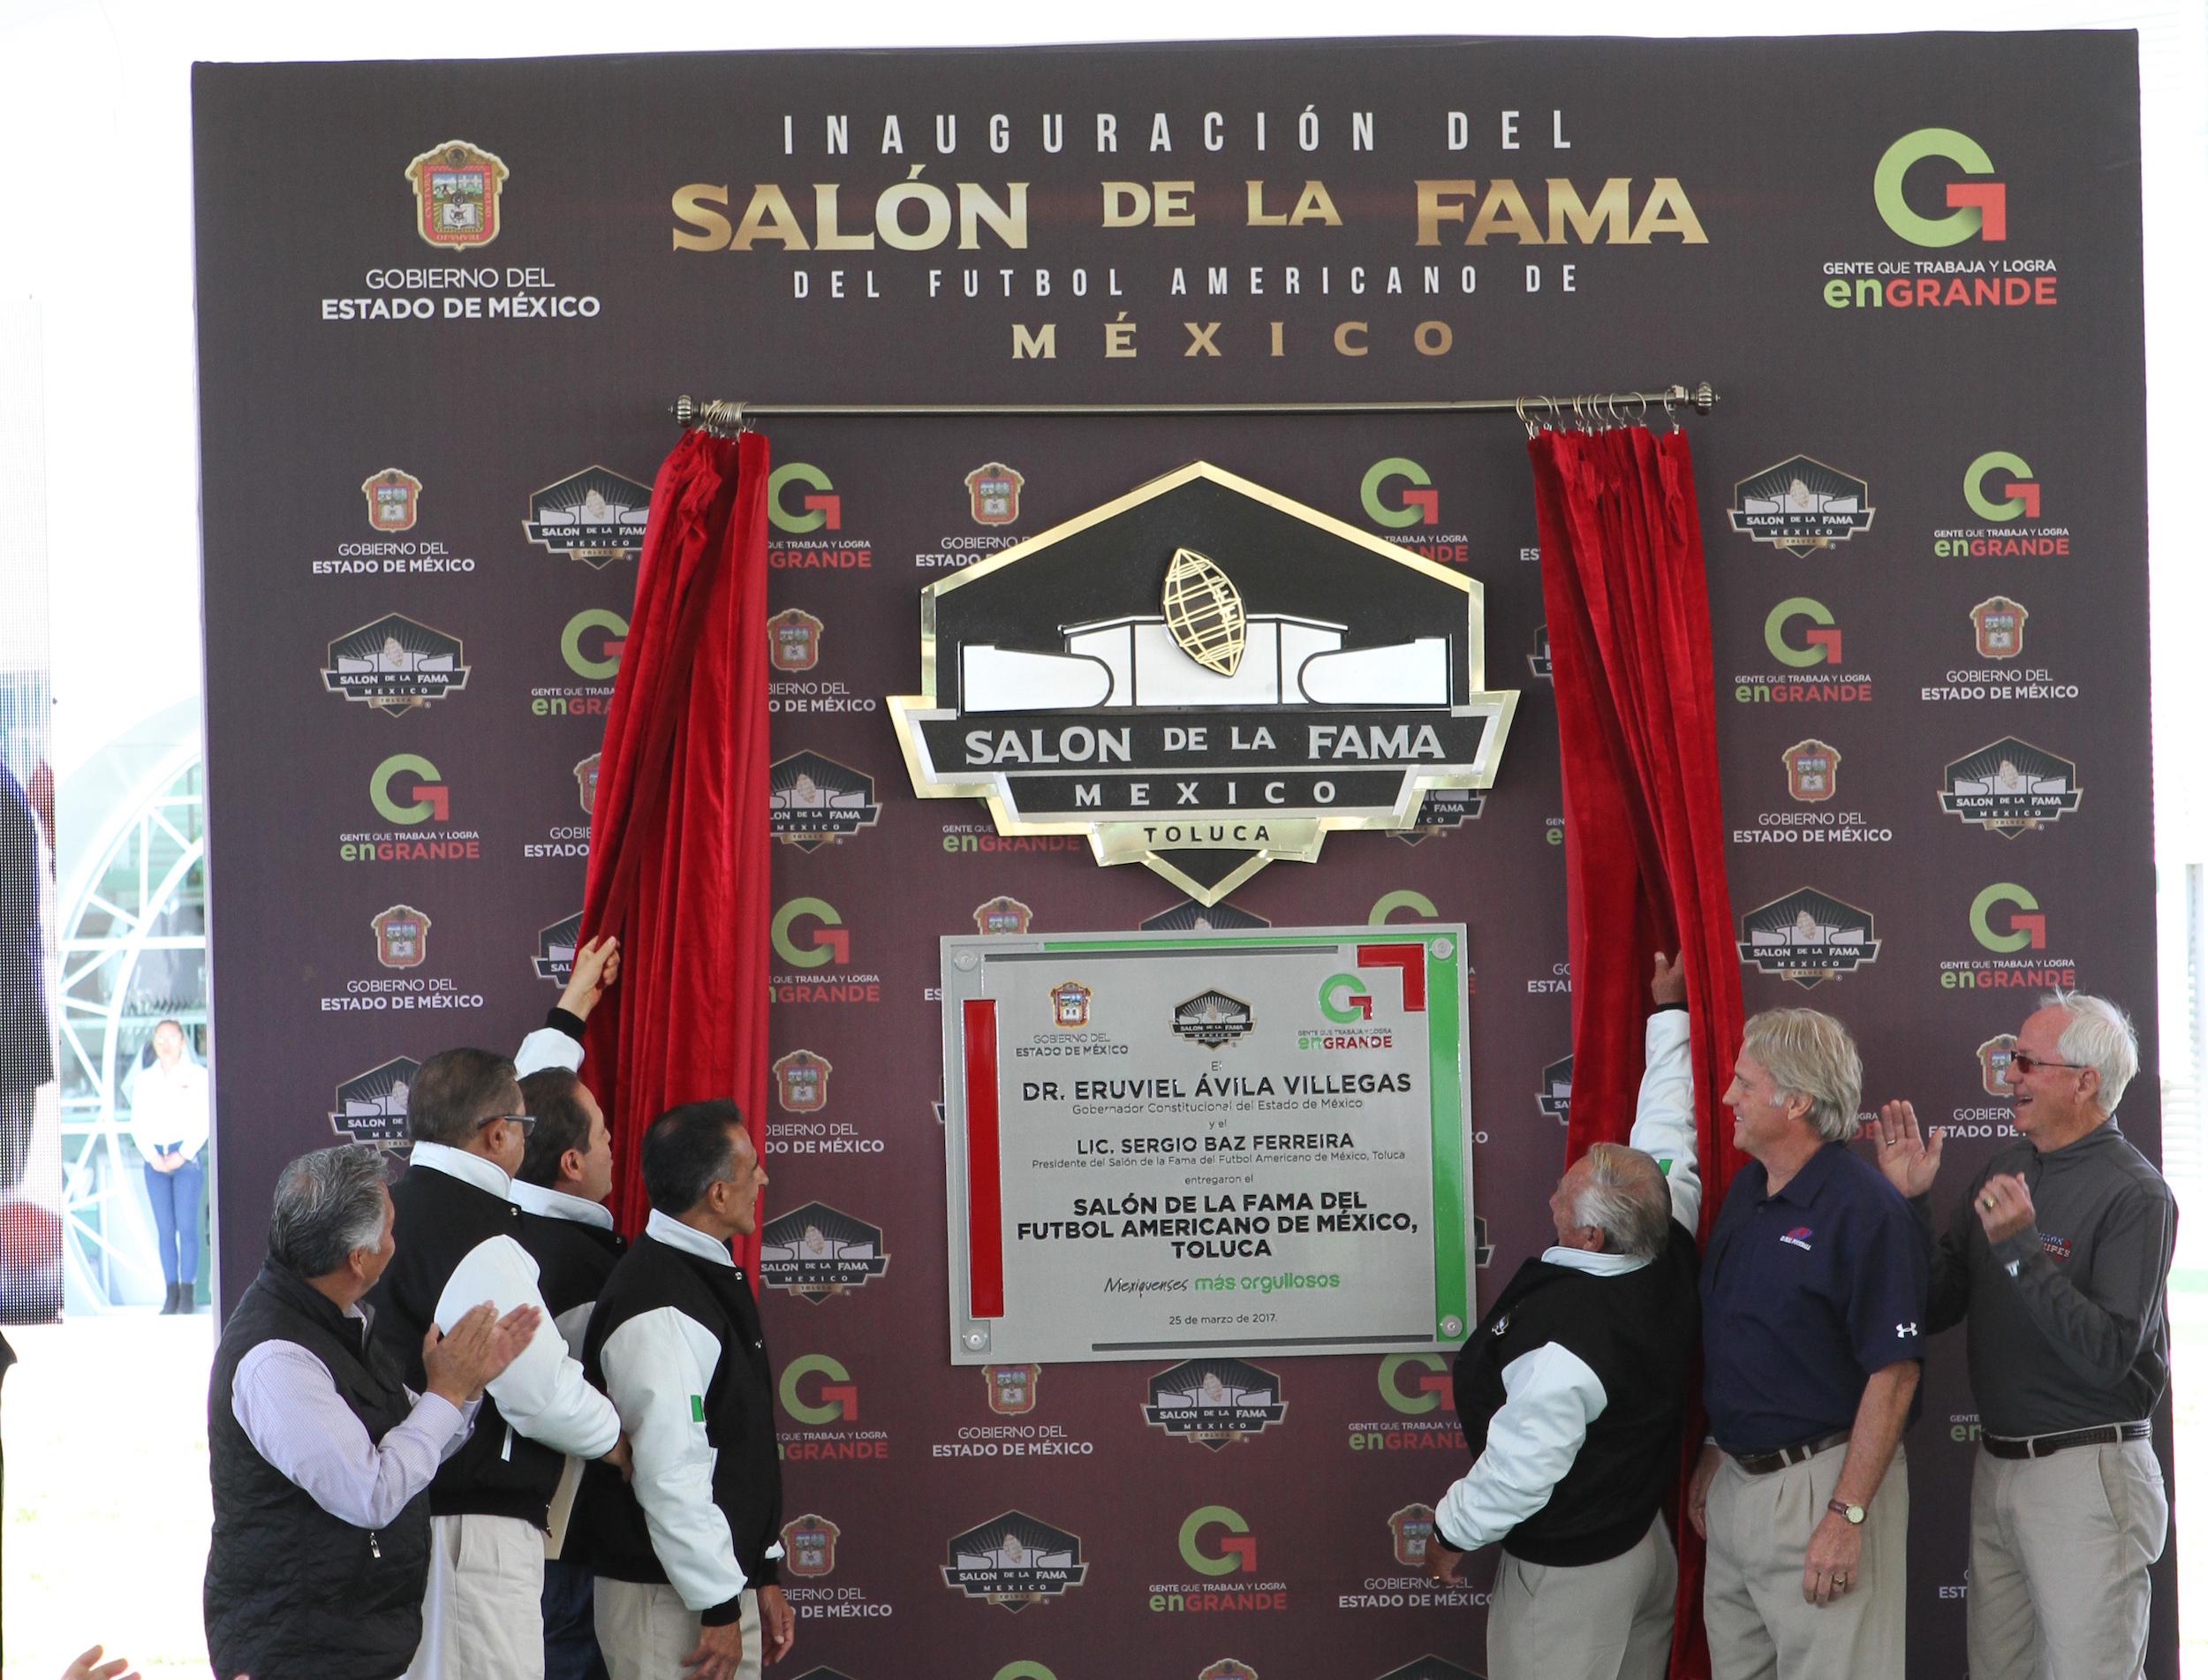 FBA México inaugura El Salón de la Fama  f3973890b54